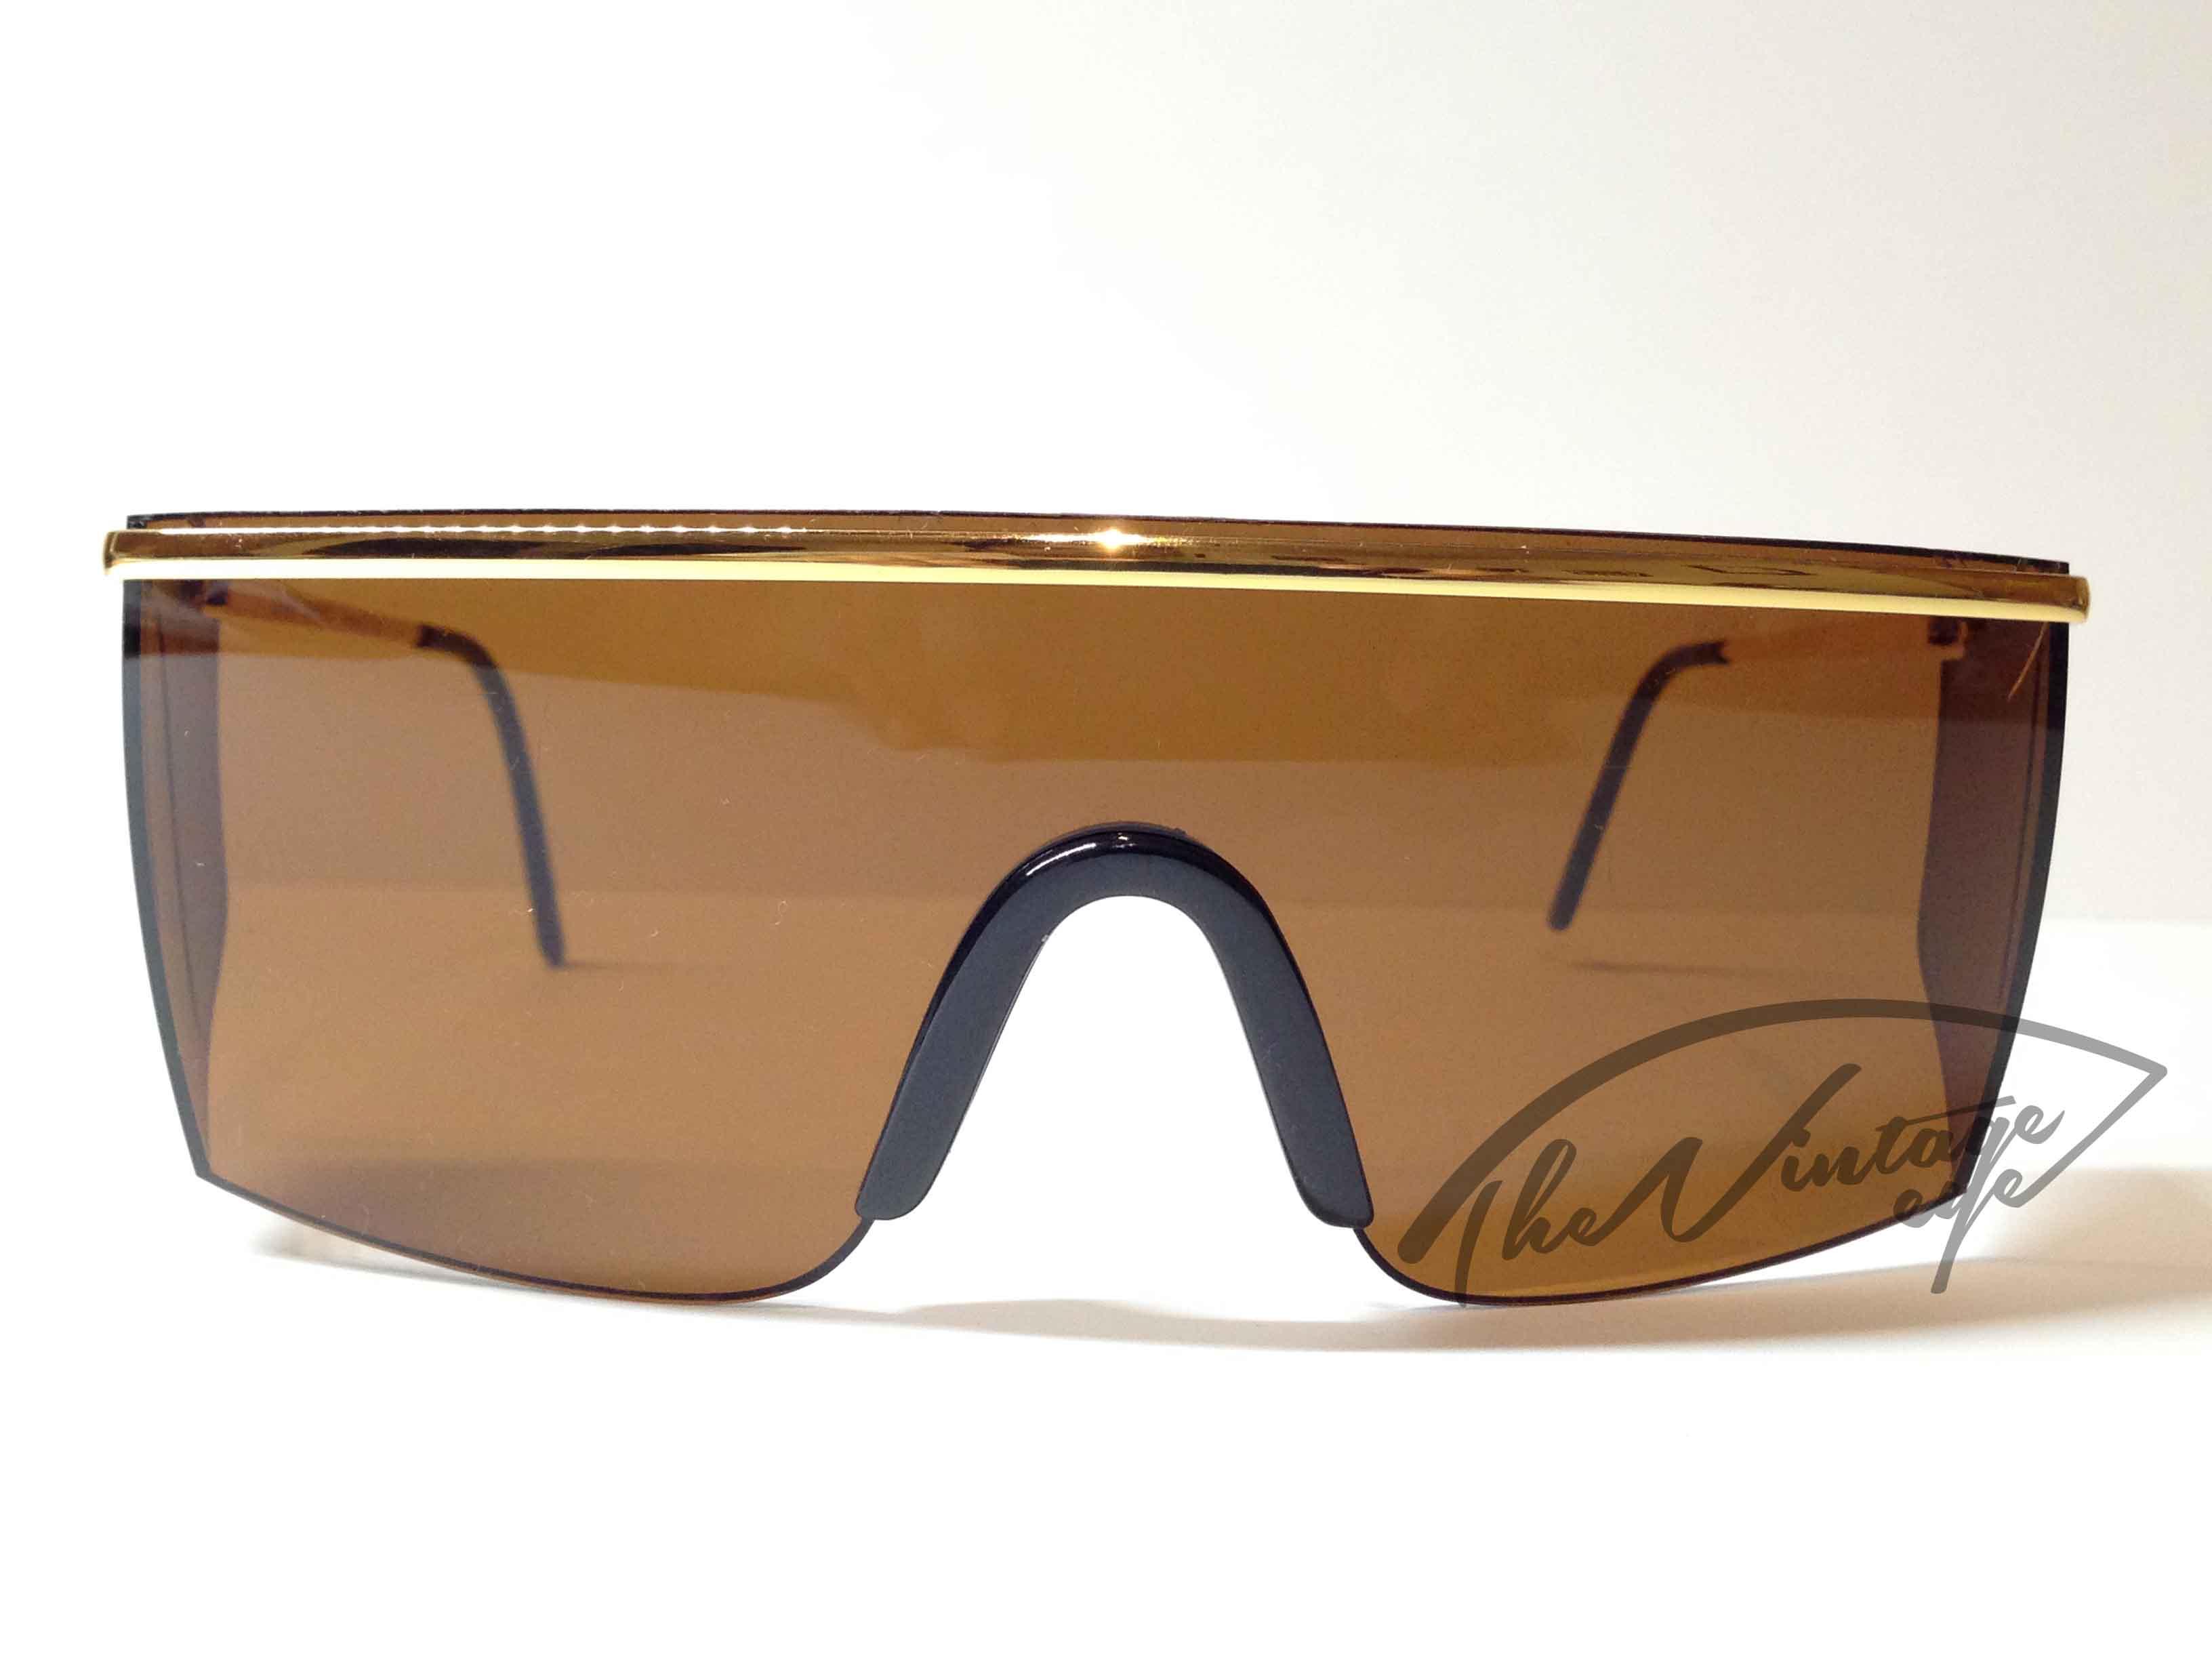 09ce23cde1 Gianni Versace 790 - The Vintage Eye